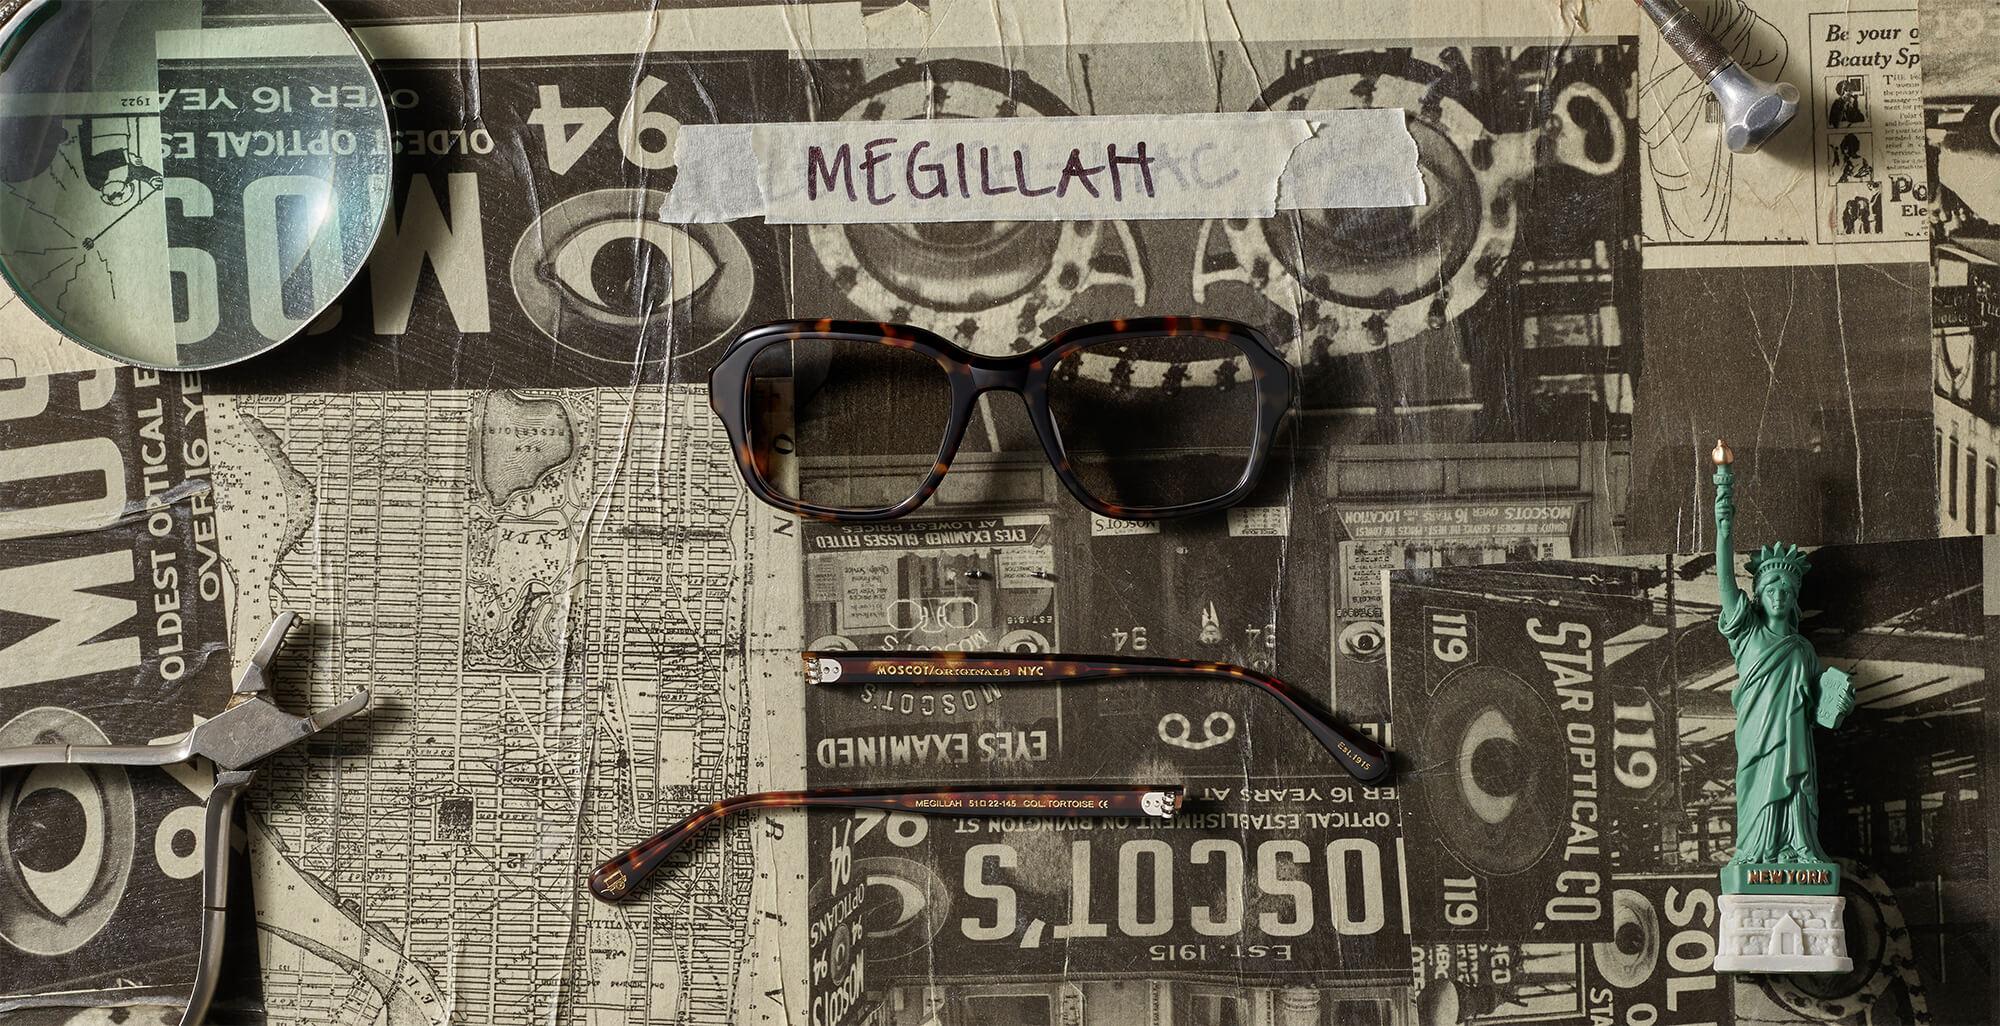 MEGILLAH